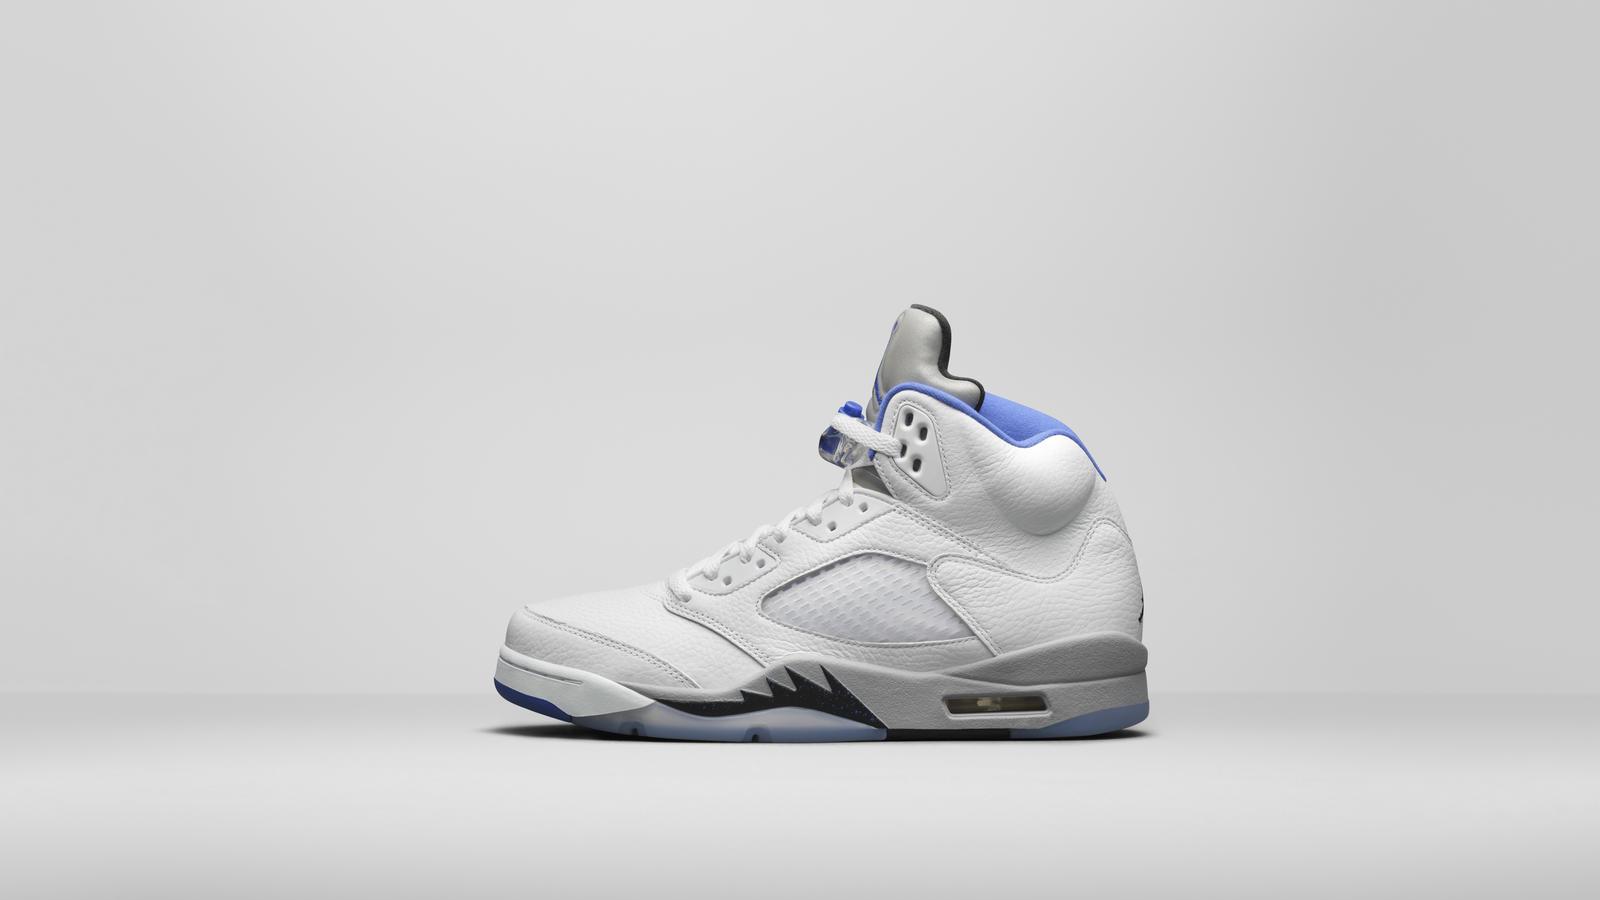 Jordan Brand Spring 2021 Retro Releases 2